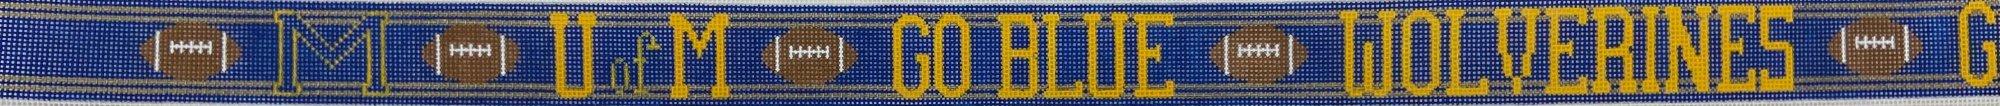 CBK382 Belt University of Michigan Football CBK Needlepoint Collections